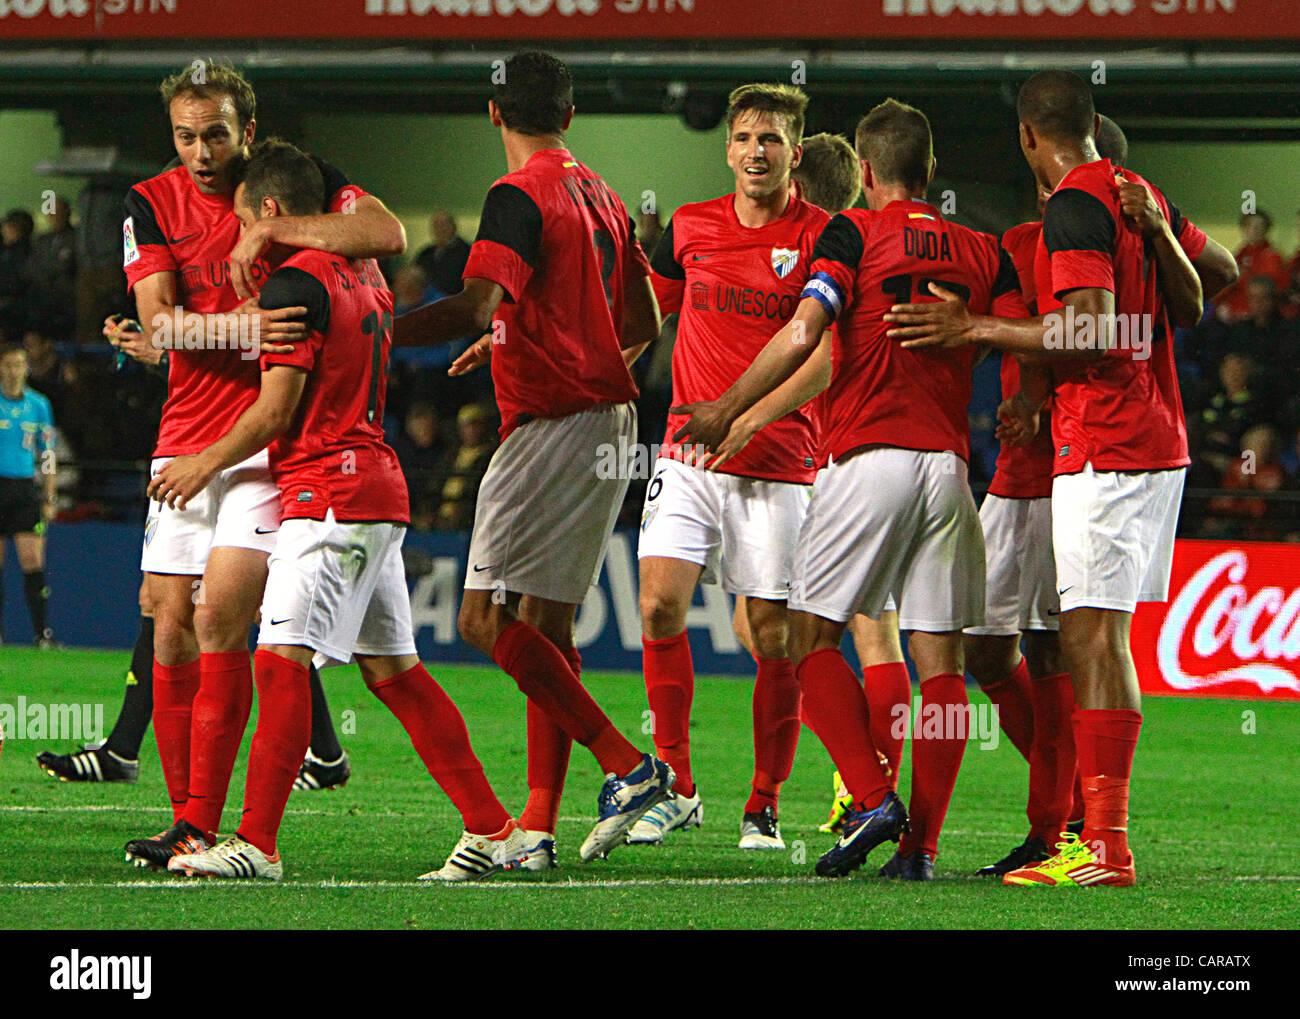 Villareal Spain  City new picture : Soccer Spain Liga Bbva Villareal Cf Vs. Malaga Cf matchday 33 ...